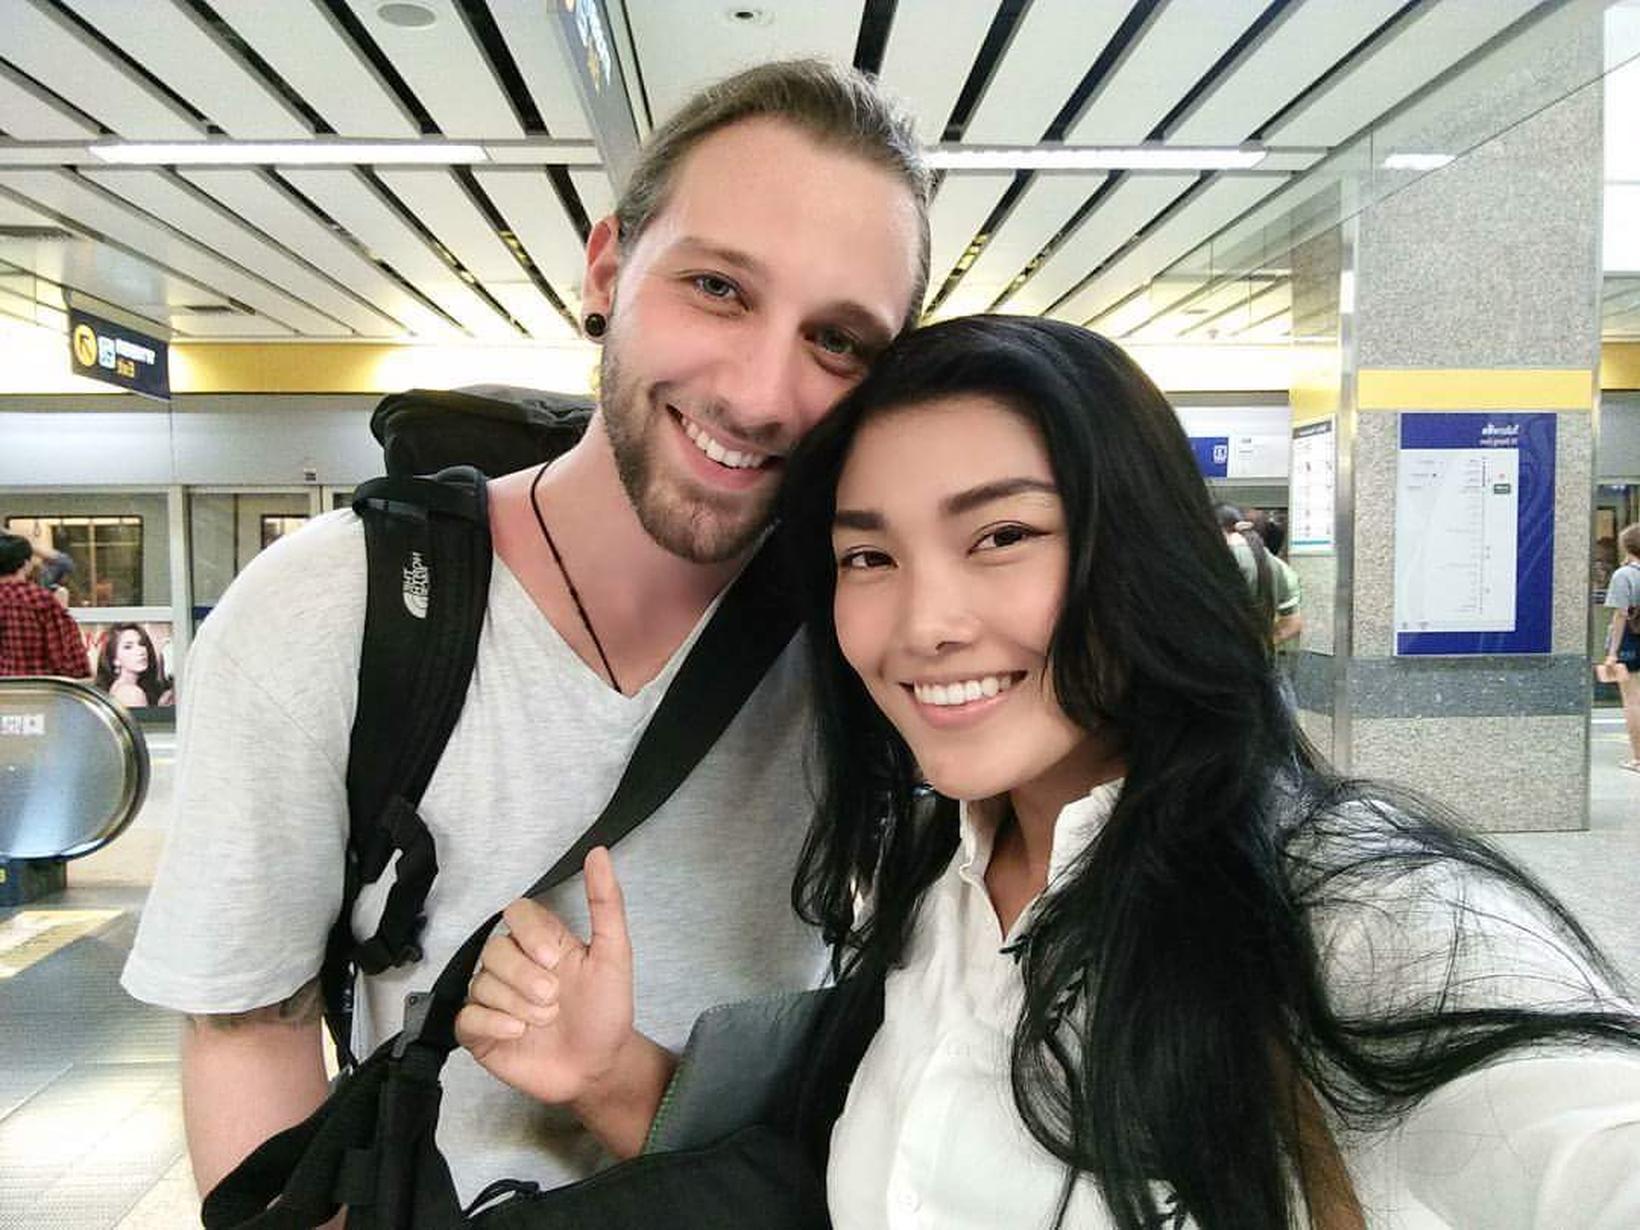 Joshua & Natwaramon from Bangkok, Thailand